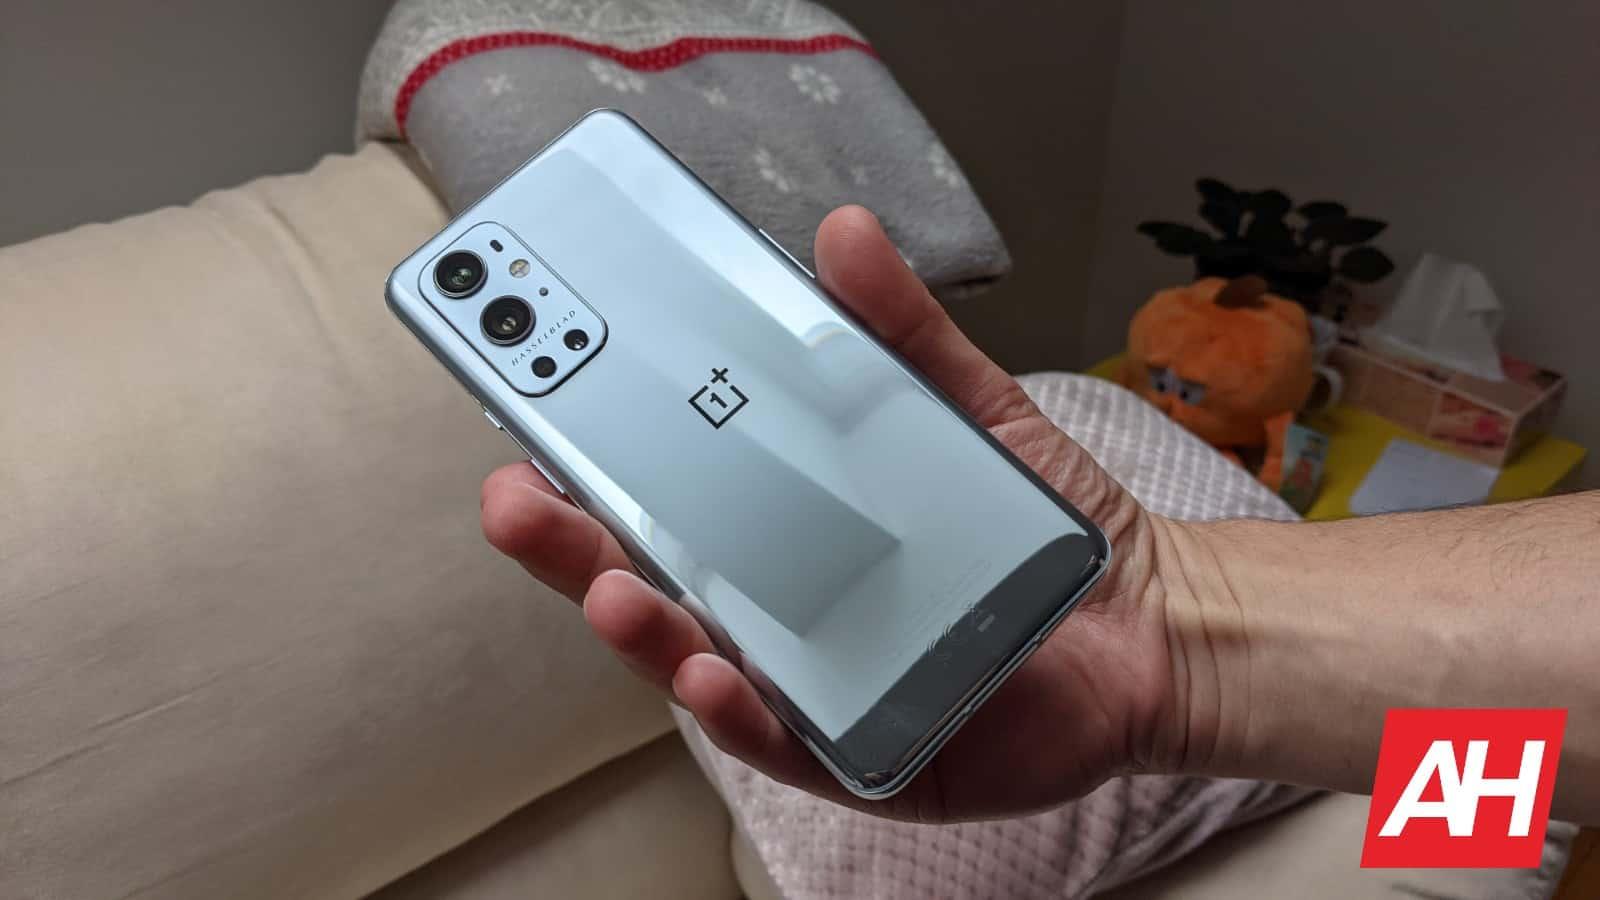 AH OnePlus 9 Pro KL image 15